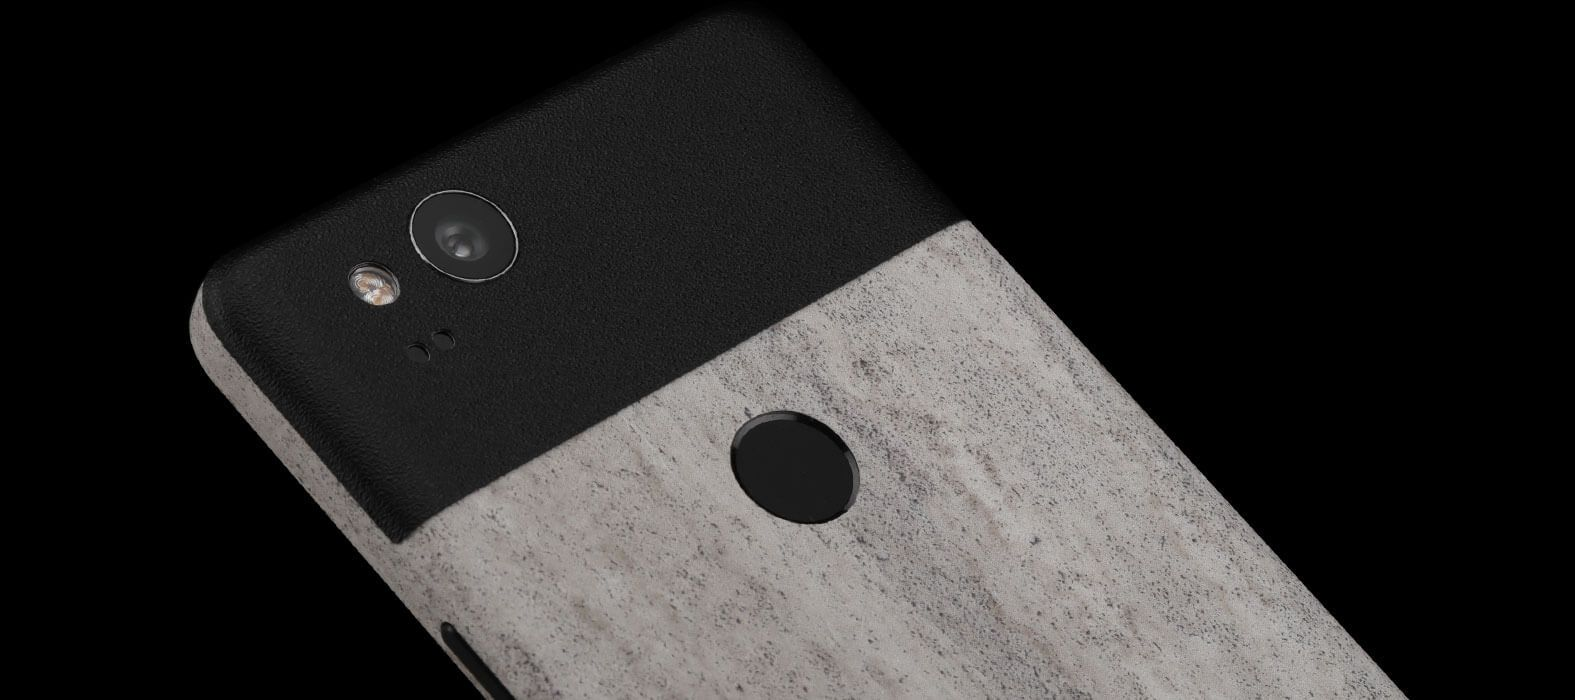 Pixel 2 Wraps, Skins, Decals, Concrete